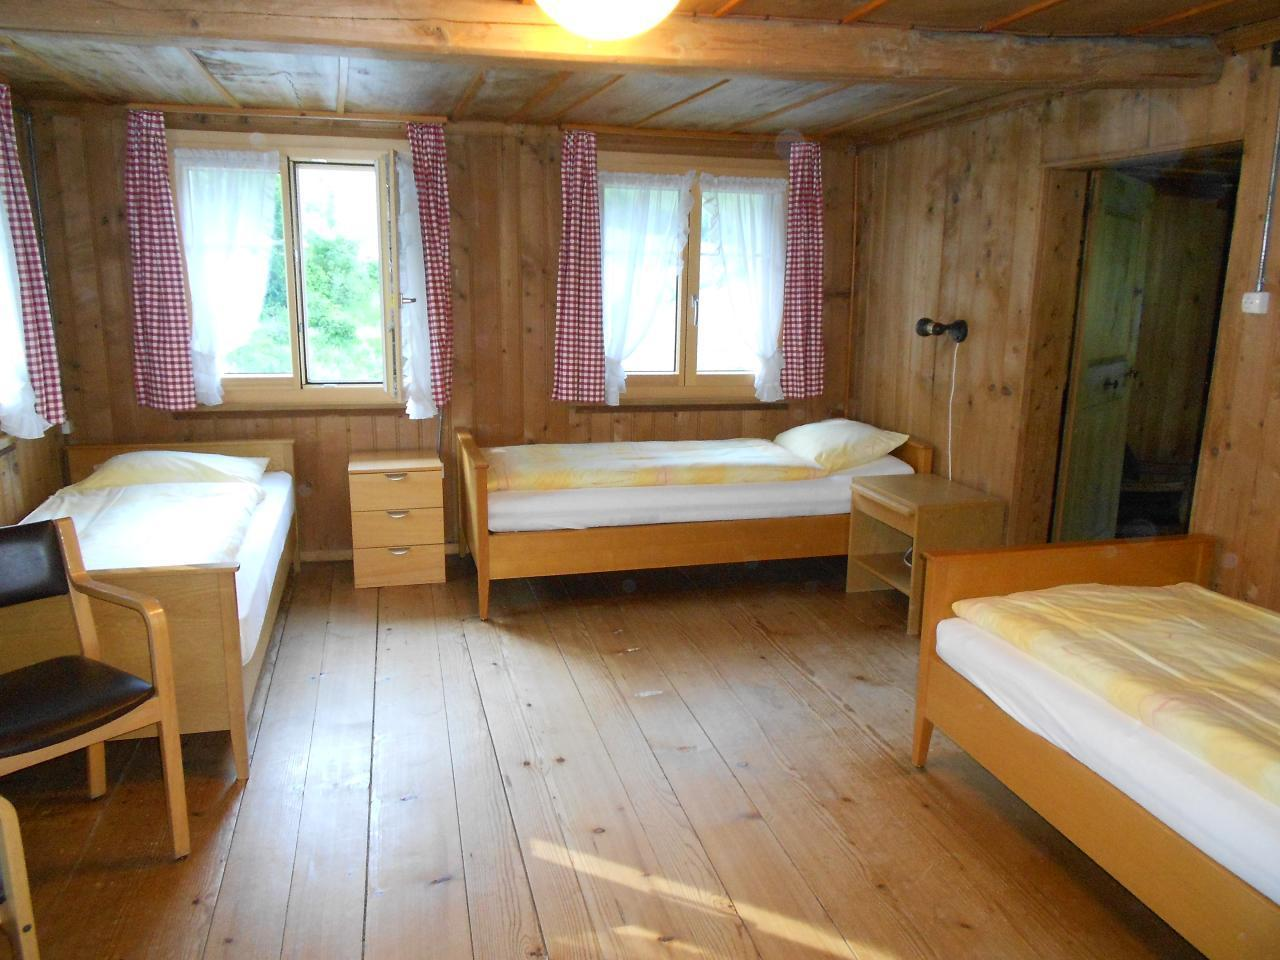 Maison de vacances Alpenrösli in Nesslau (2640830), Nesslau, Toggenbourg, Suisse Orientale, Suisse, image 6